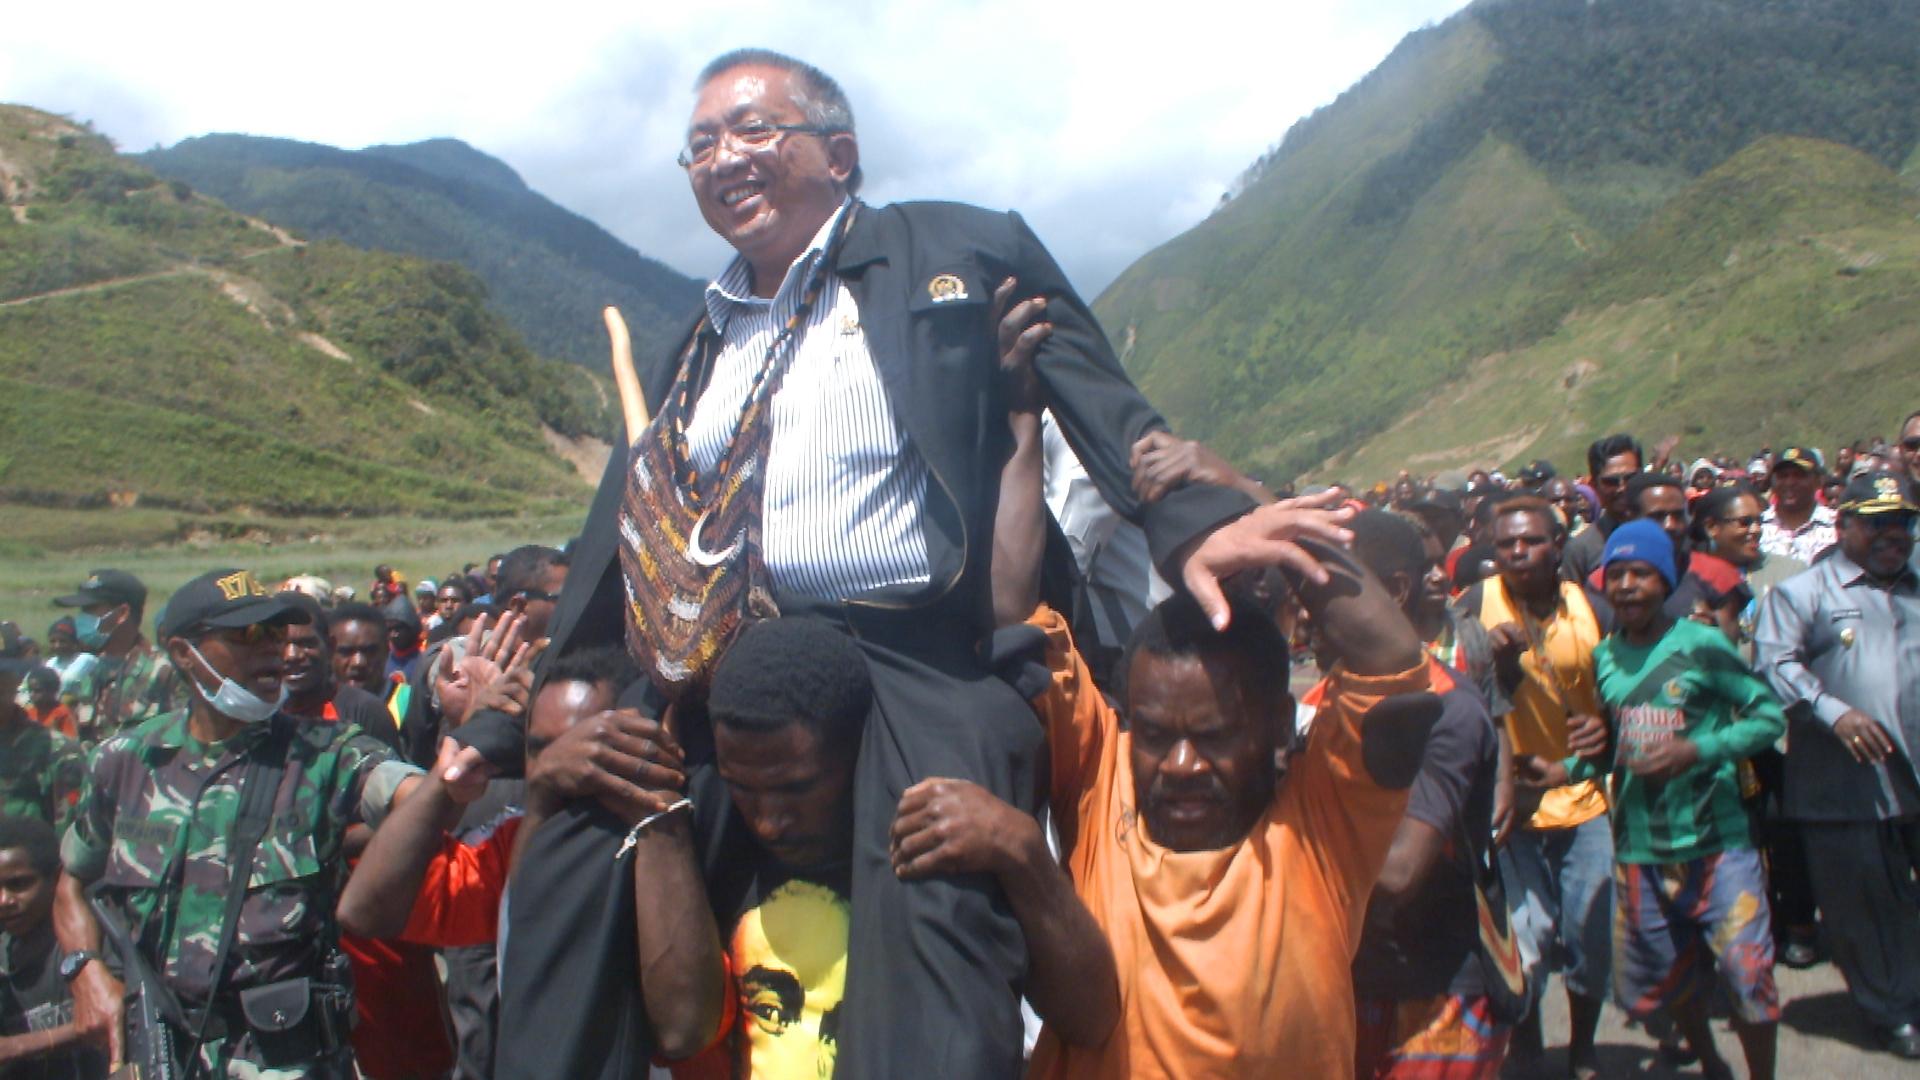 Ketua Komite I DPD RI disambut dan diarak oleh masyarakat dari bandara menuju lapangan